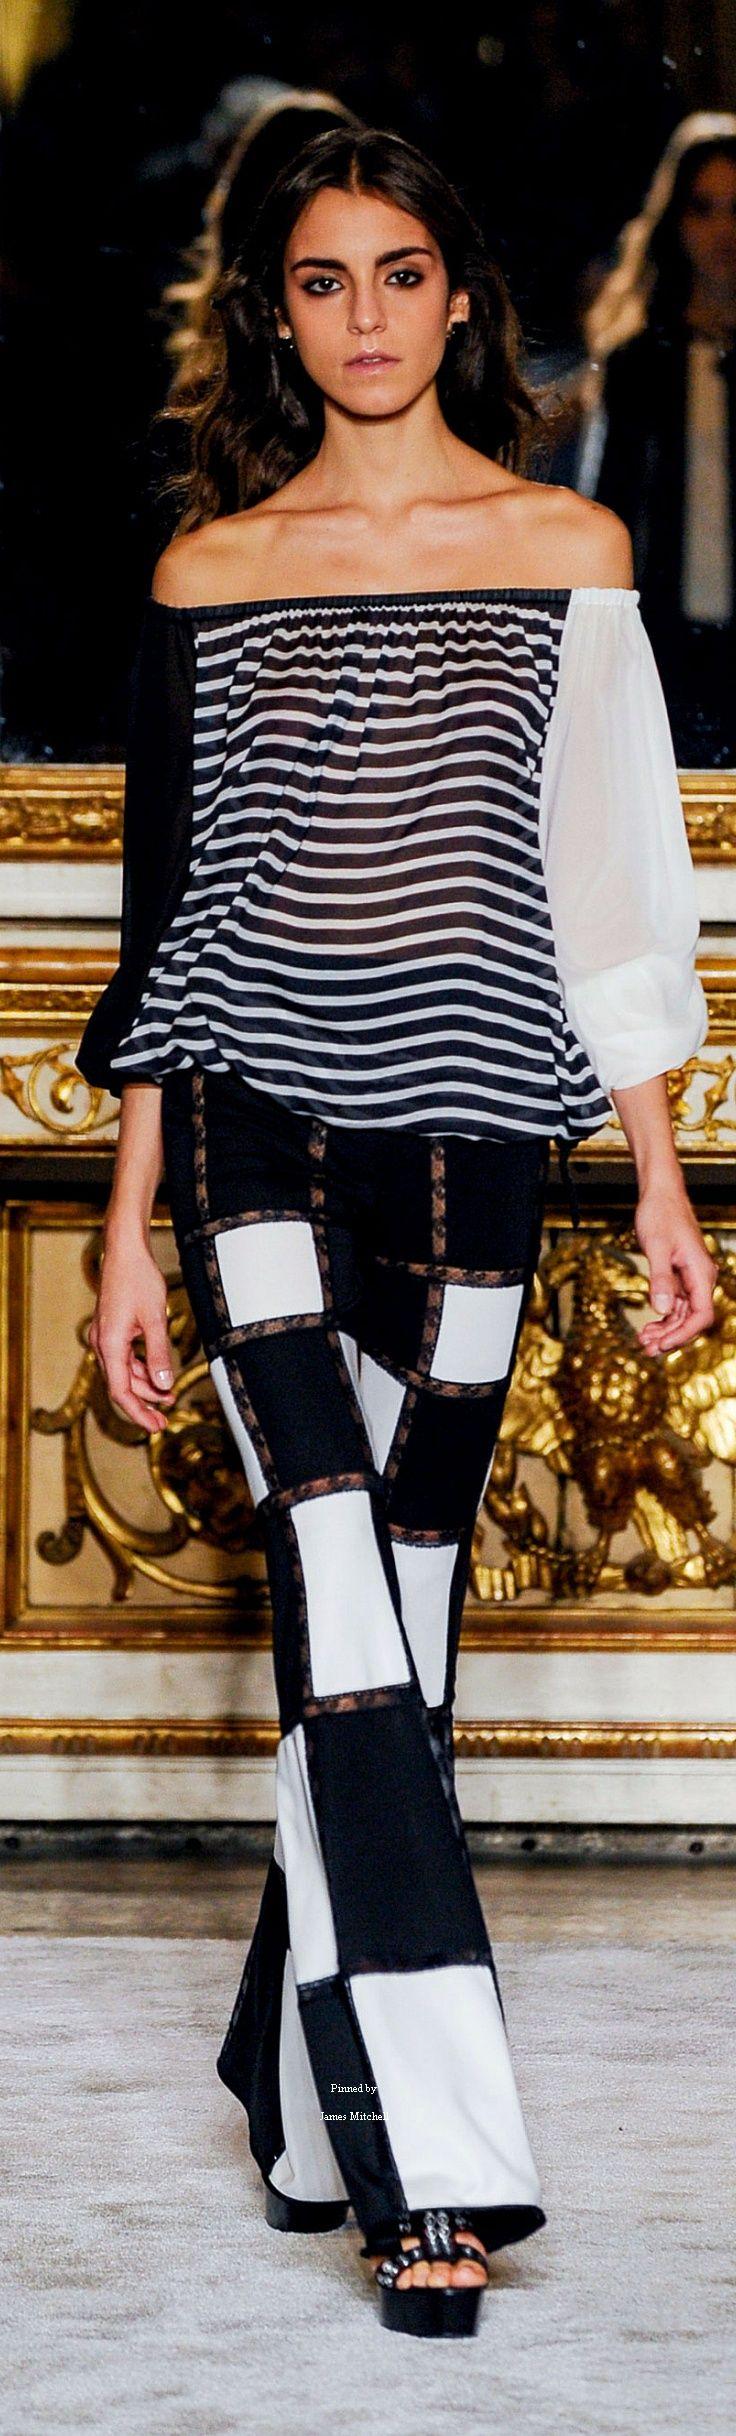 #Farbbberatung #Stilberatung #Farbenreich mit www.farben-reich.com Black and White spring wear